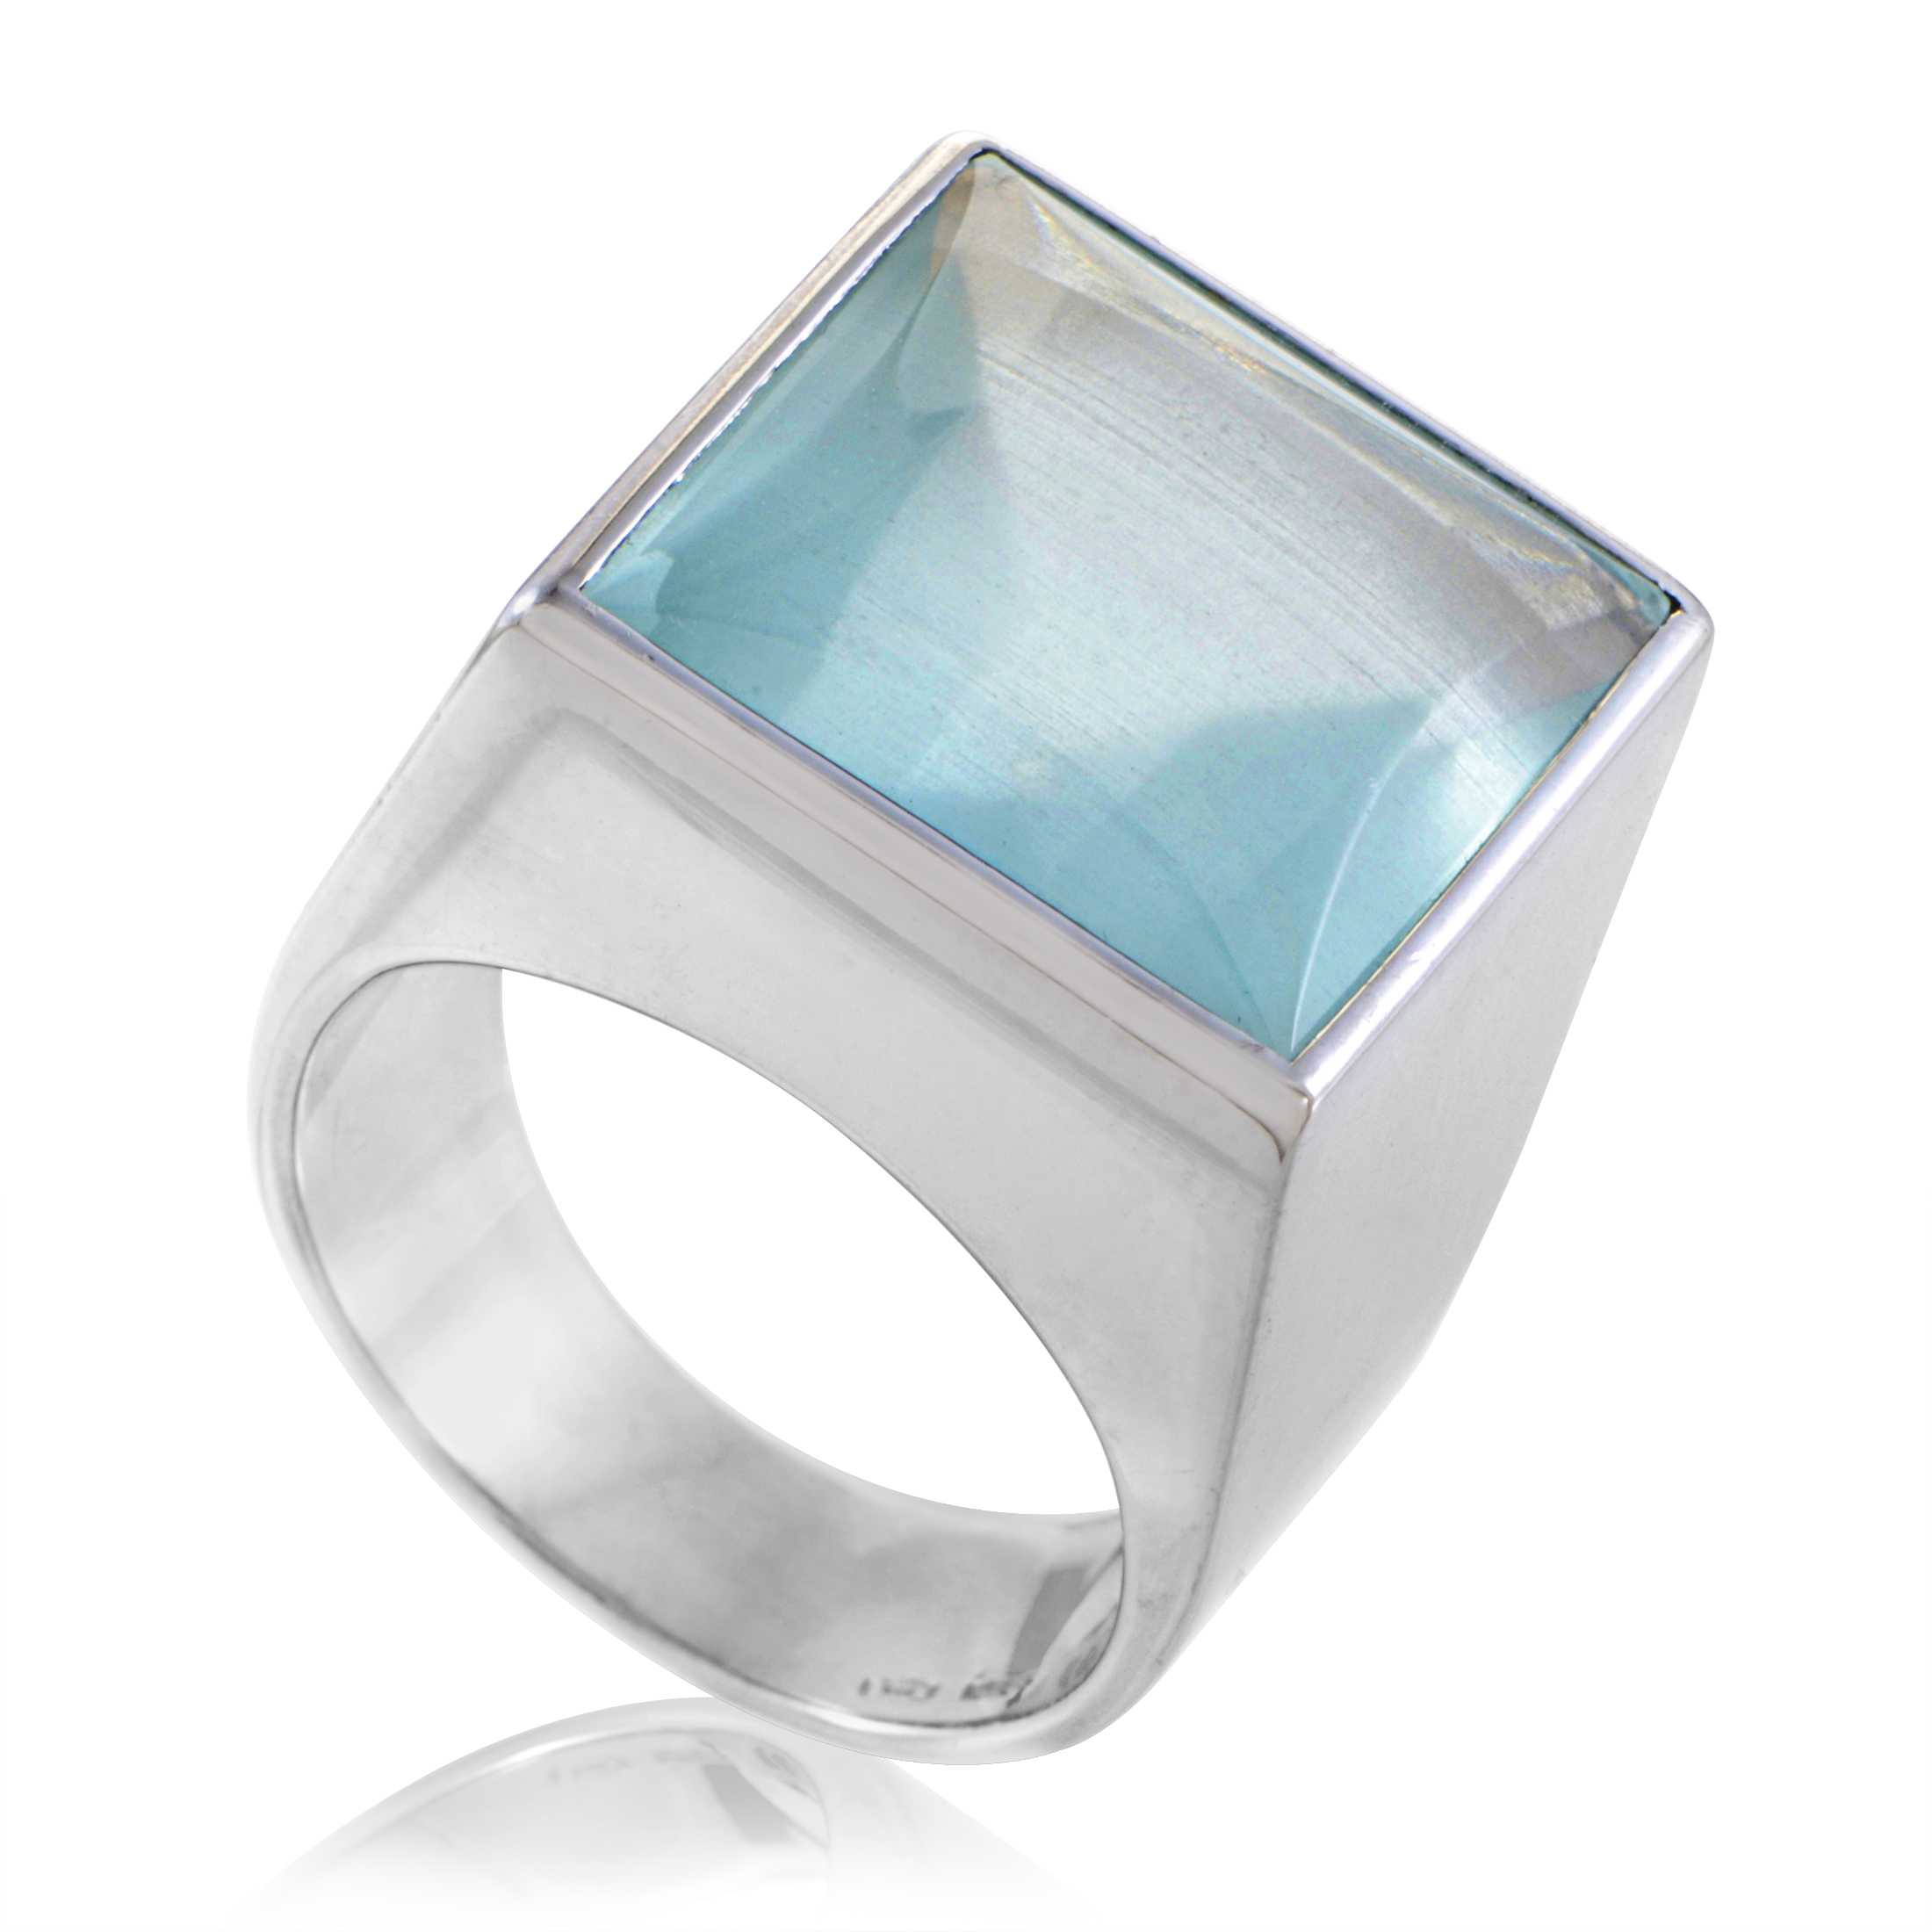 Gucci Women's 18K White Gold Aquamarine Ring